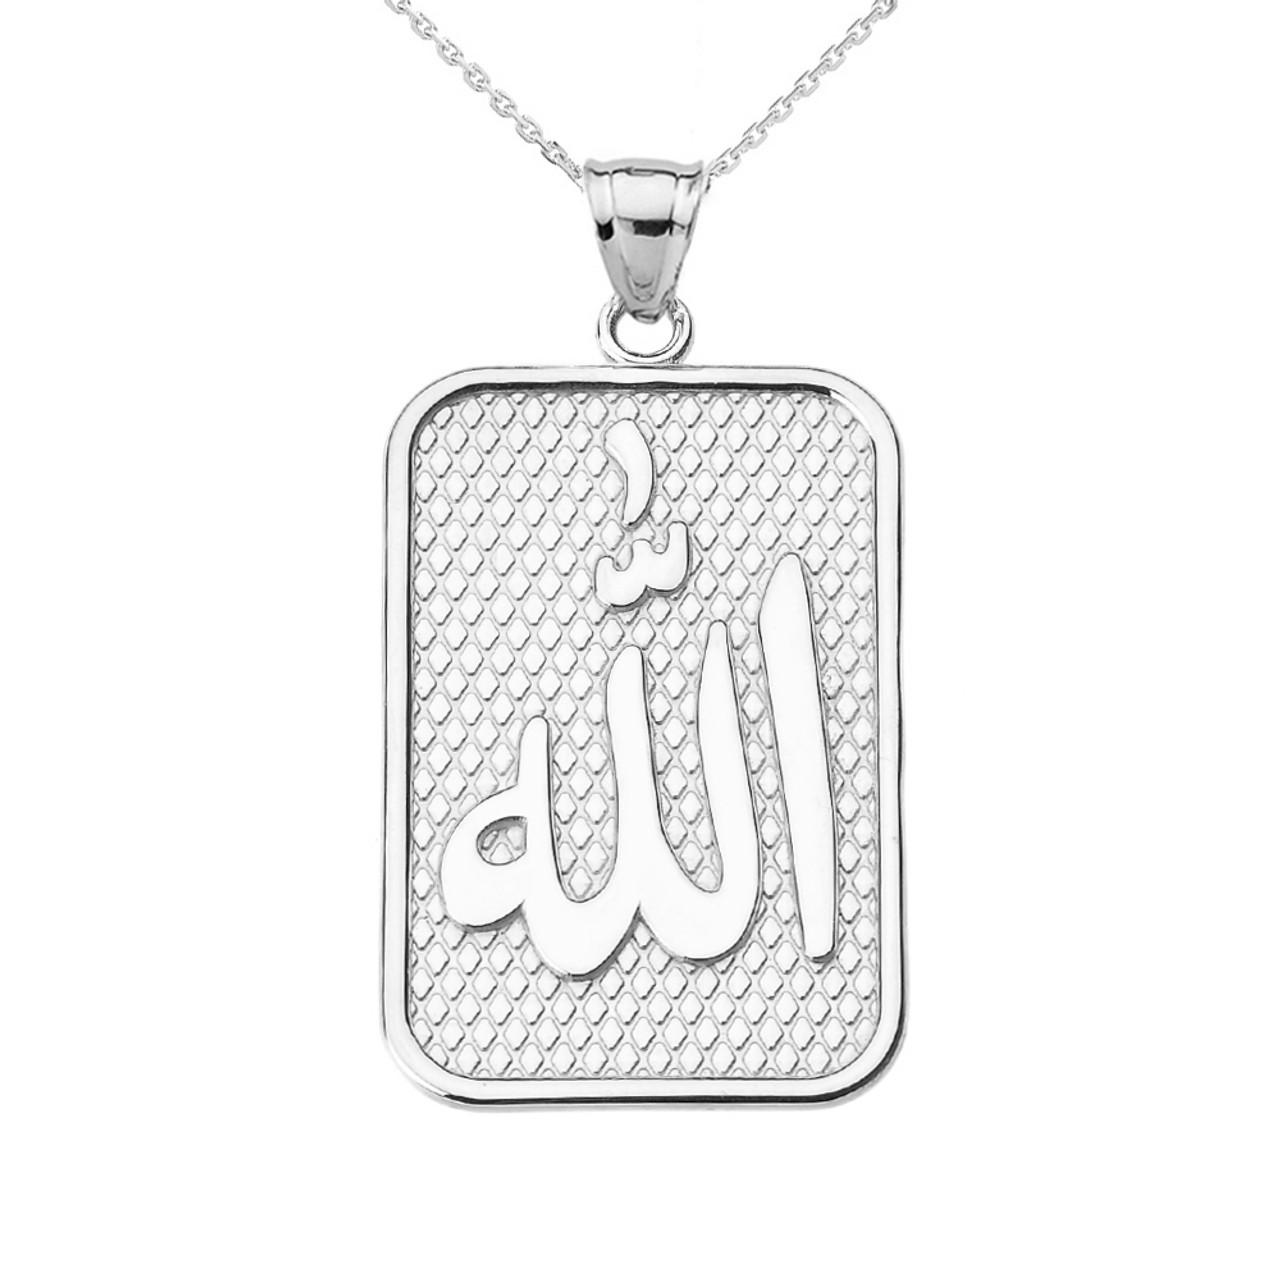 White gold allah pendant necklace white gold allah pendant necklace aloadofball Gallery